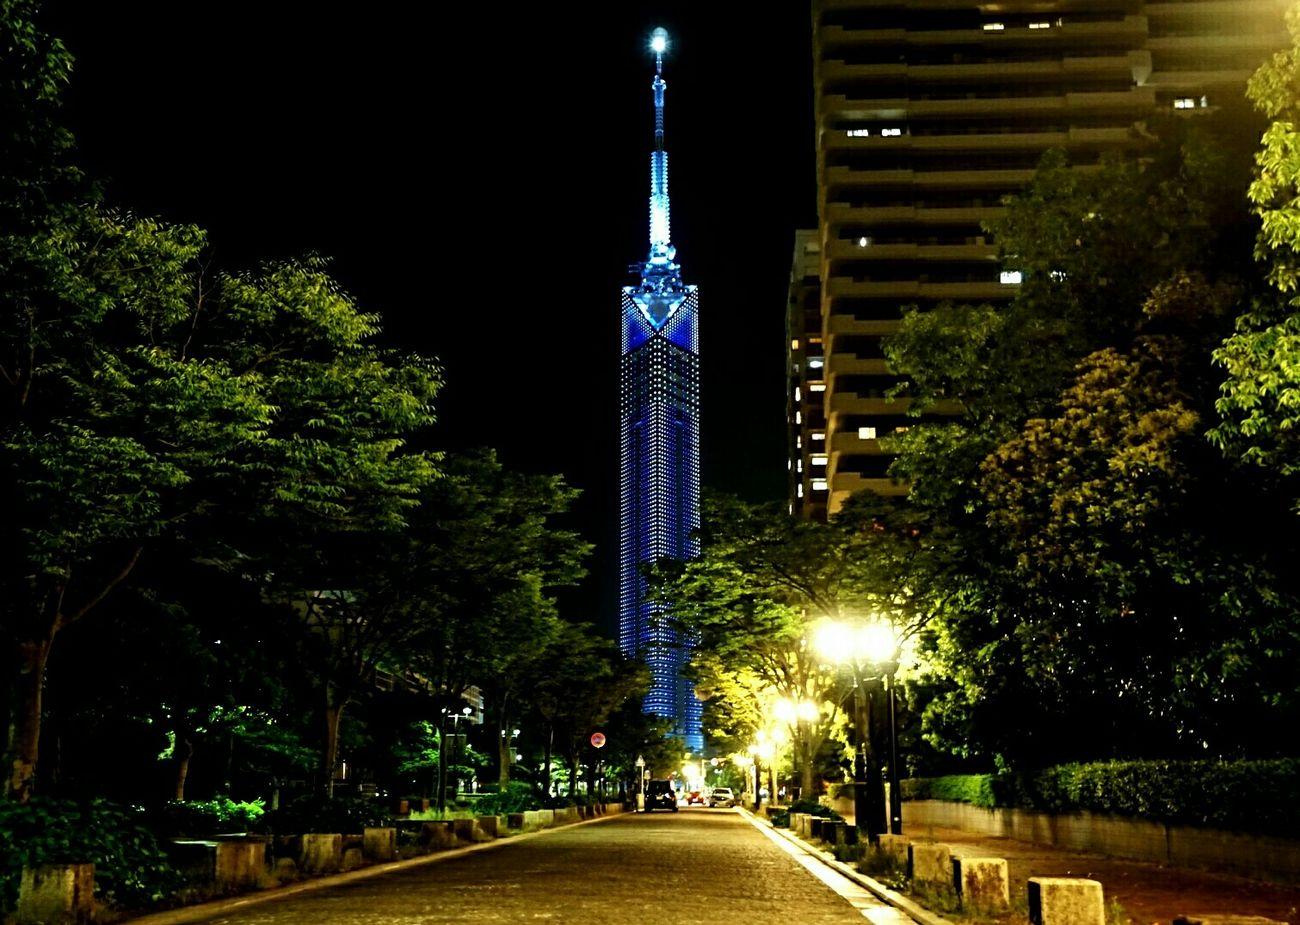 Fukuoka,Japan Fukuoka-shi Fukuoka-japan Fukuoka City  Fukuoka Tower Night Photography Nightshot Nightphotography Night View Night Lights